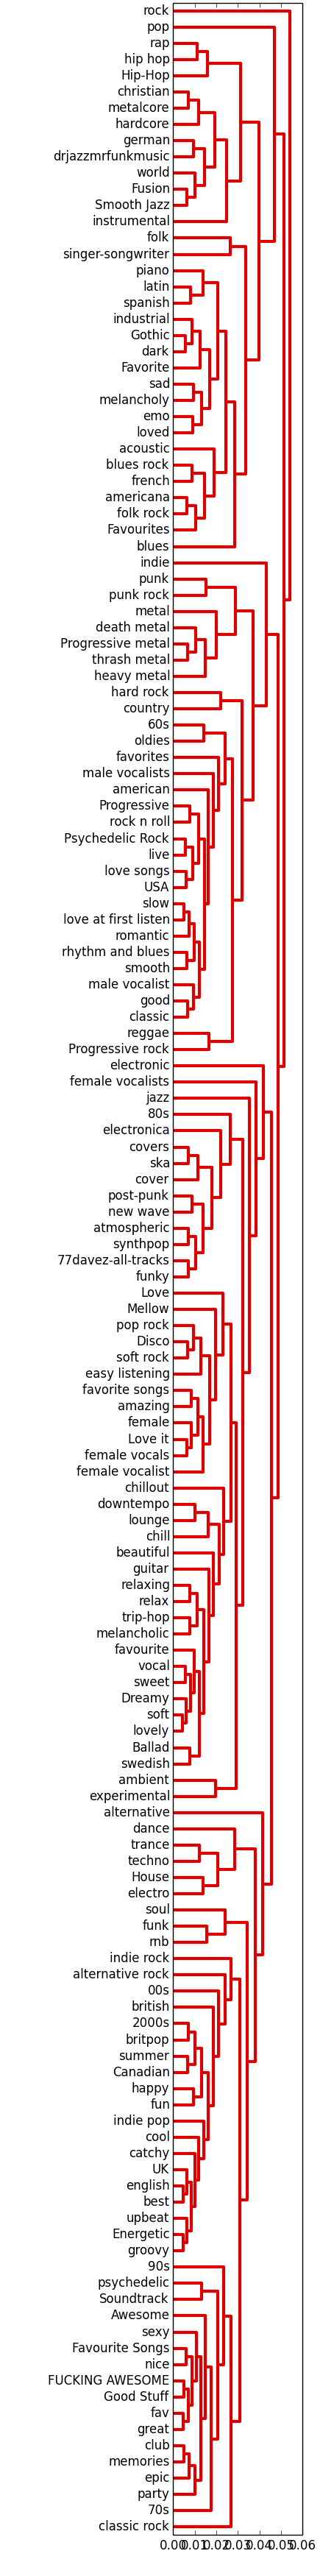 ea_music_chosen_5000-inf